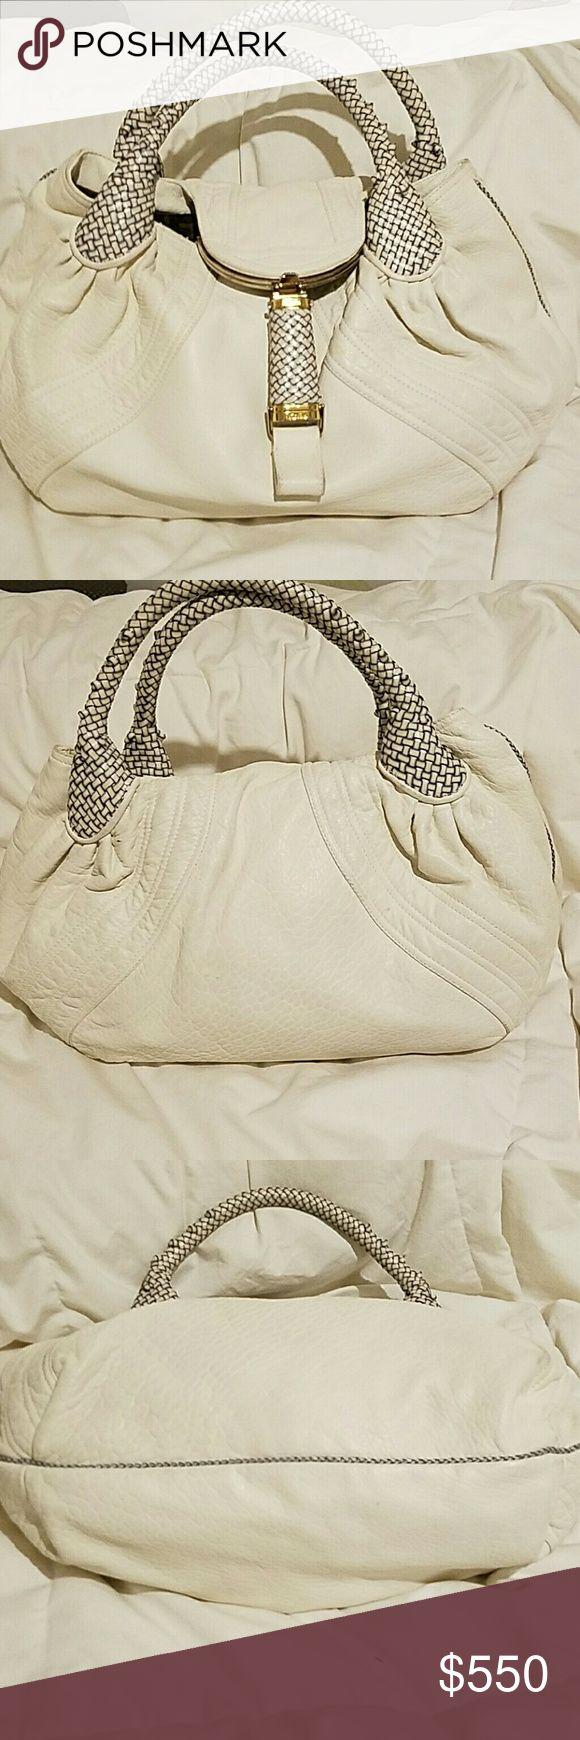 Fendi Spy Bag white Gently used. Fendi Bags Satchels